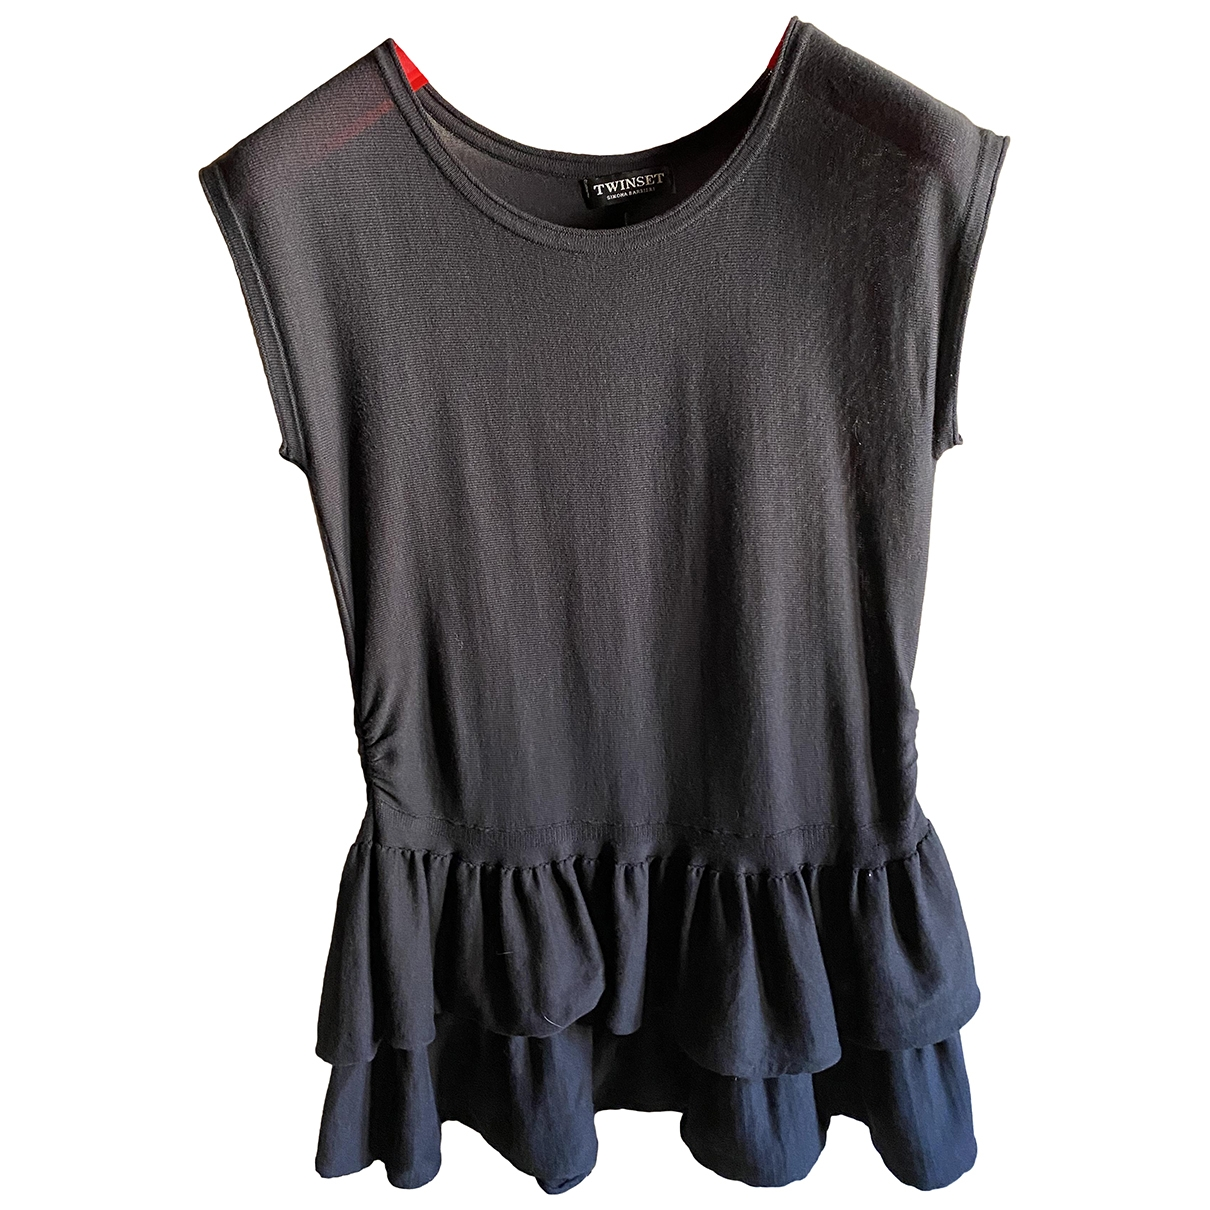 Twin Set \N Black Cotton dress for Women S International